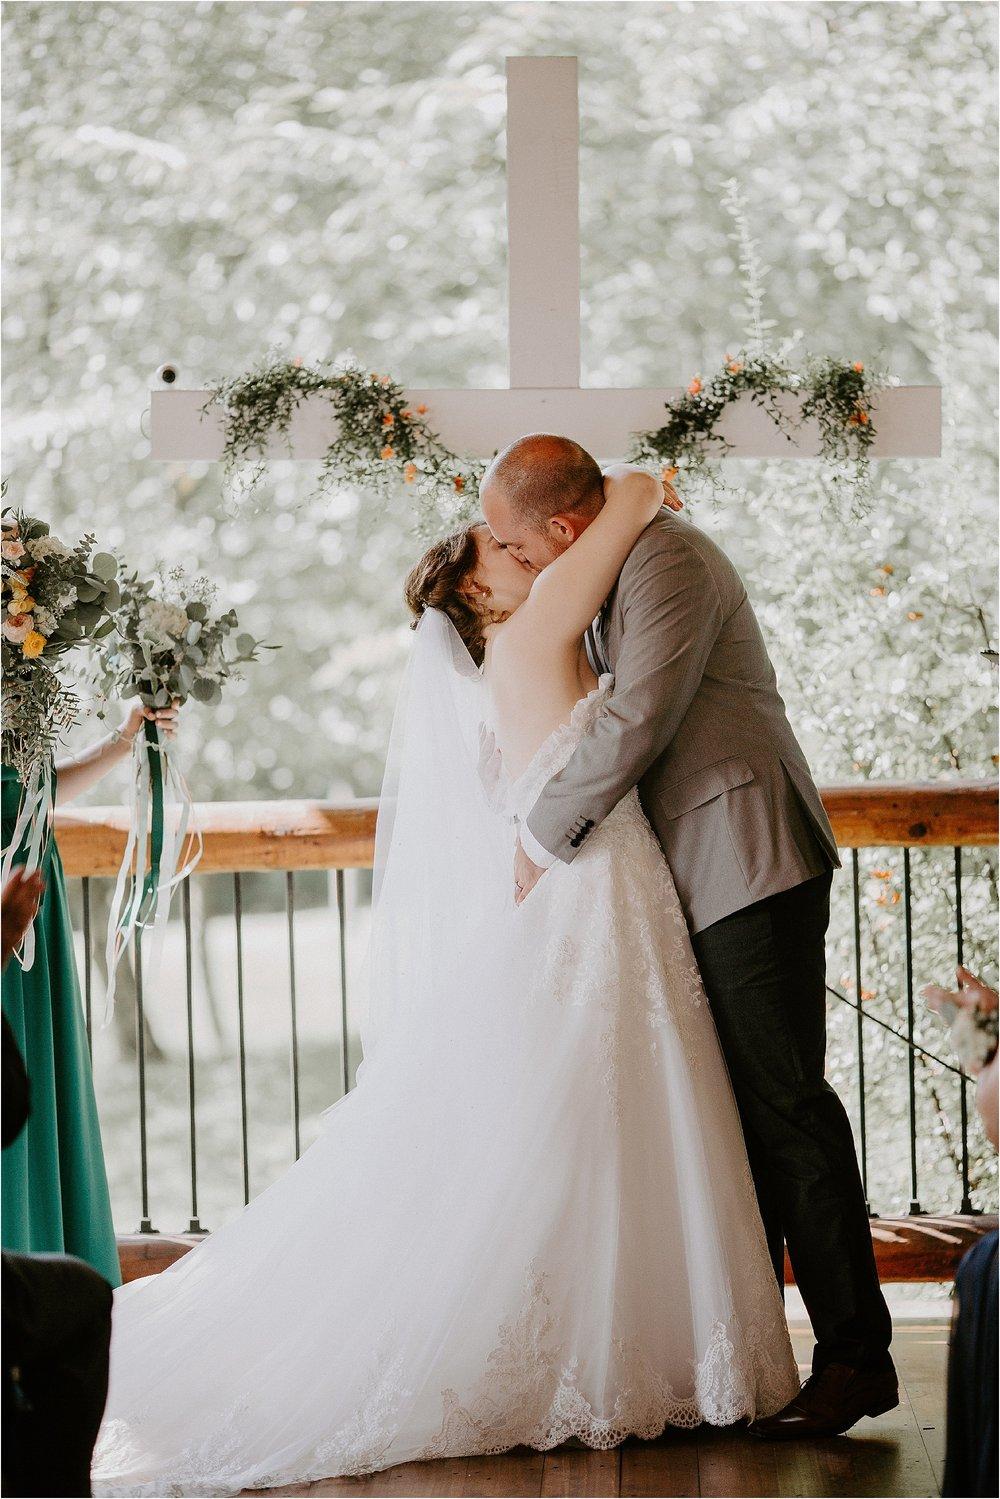 All Blog Posts — Baltimore, MD + Philadelphia, PA Traveling Wedding ...